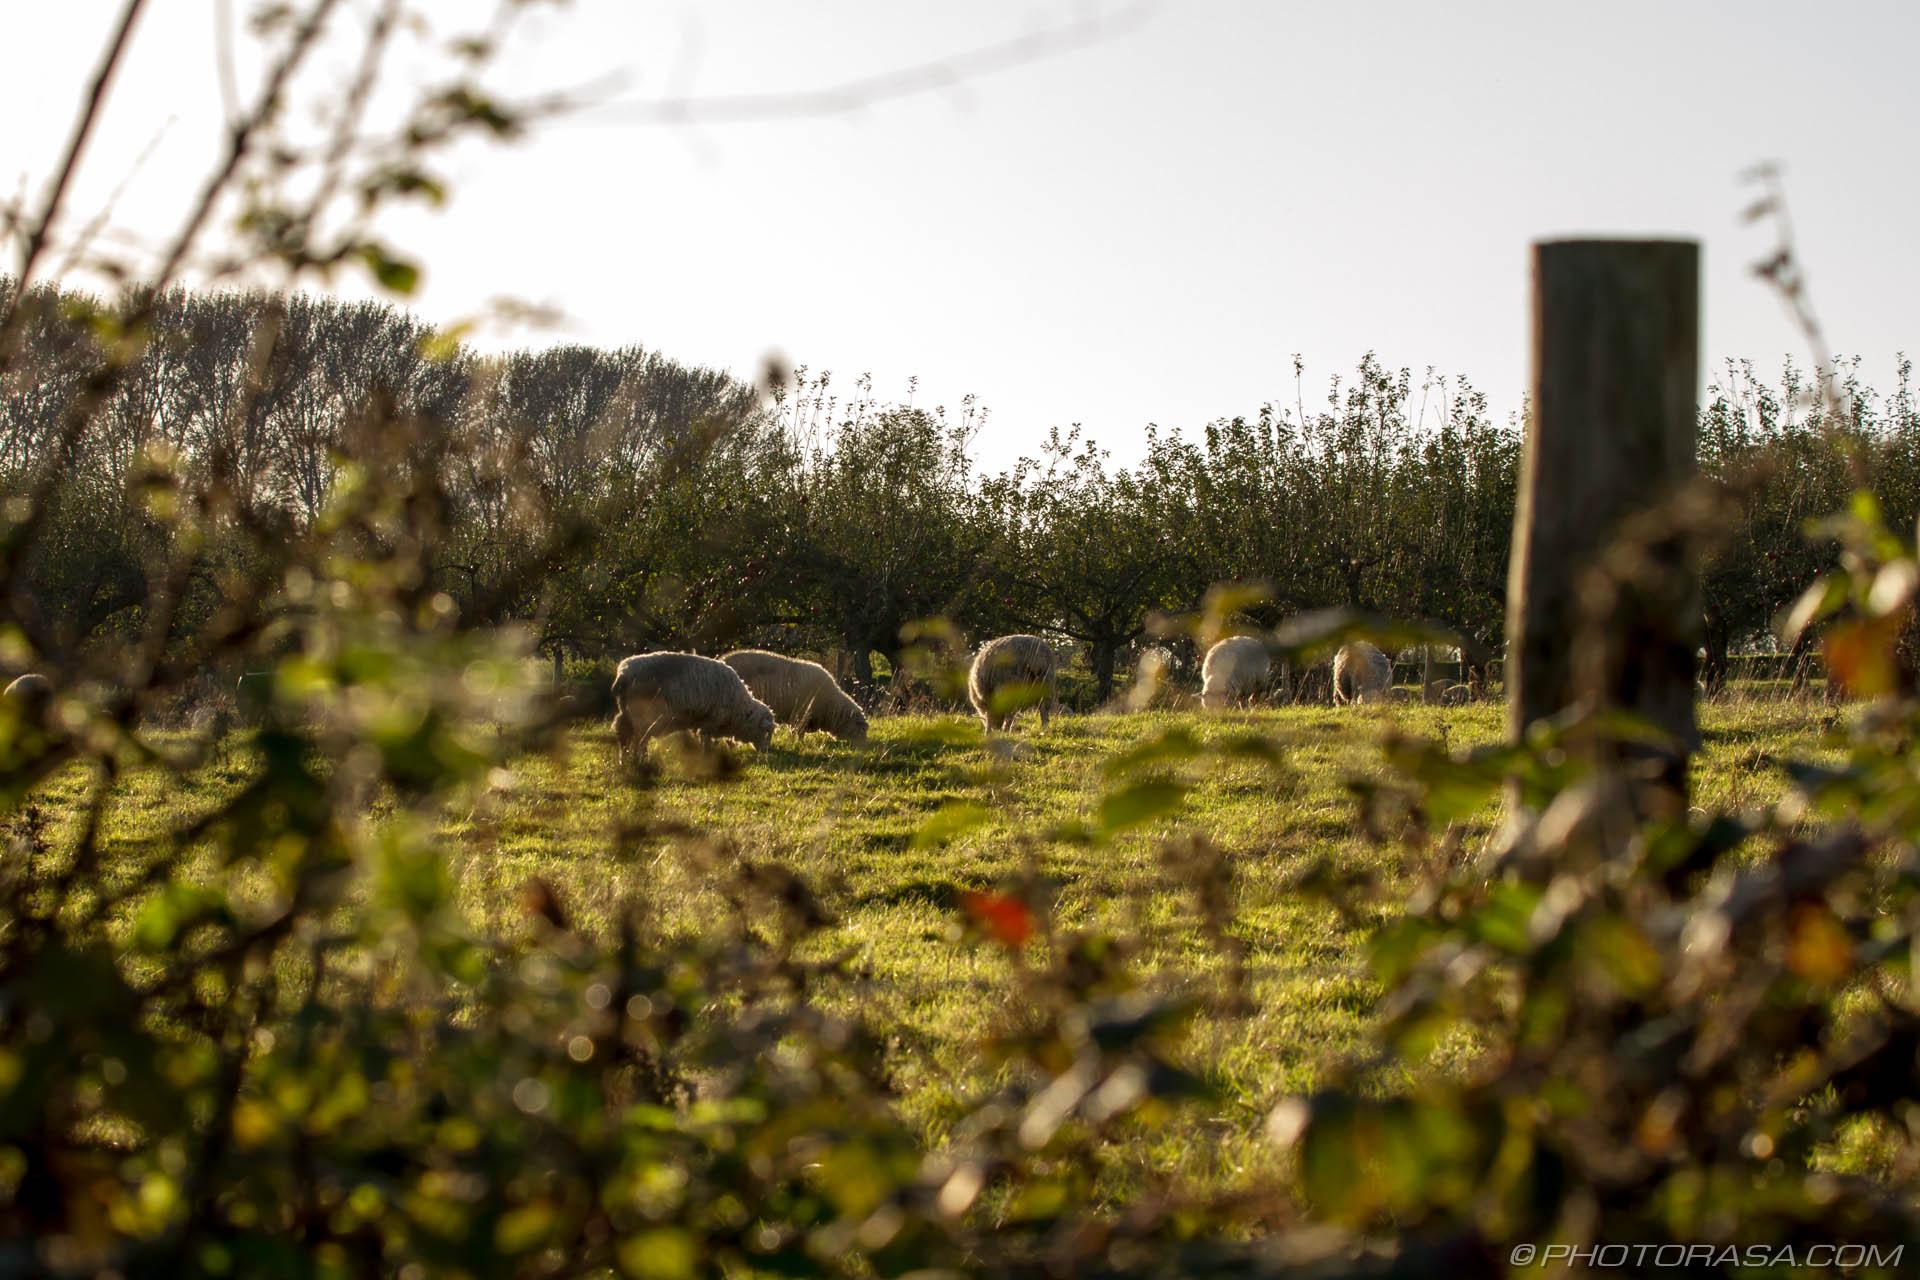 http://photorasa.com/sheep/sheep-in-a-field-through-a-fence/